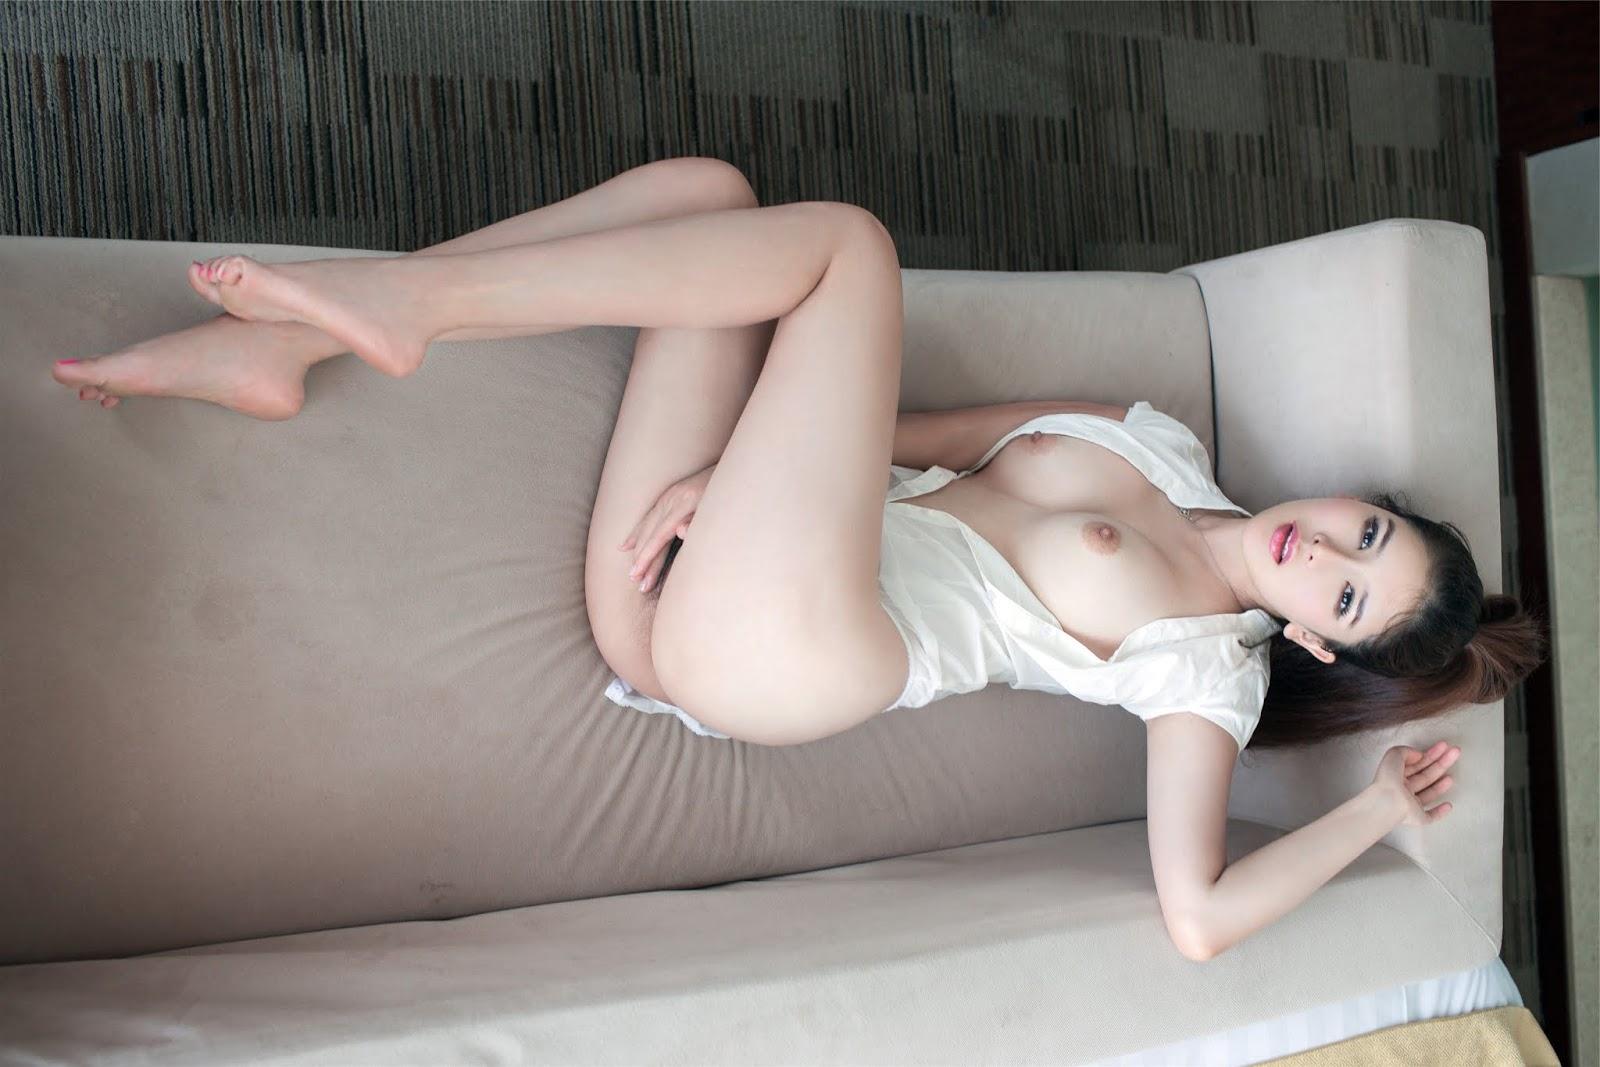 BoolWowGirls%2B%252816%2529 - Li LiSha 李丽莎 Beautiful Nude Model